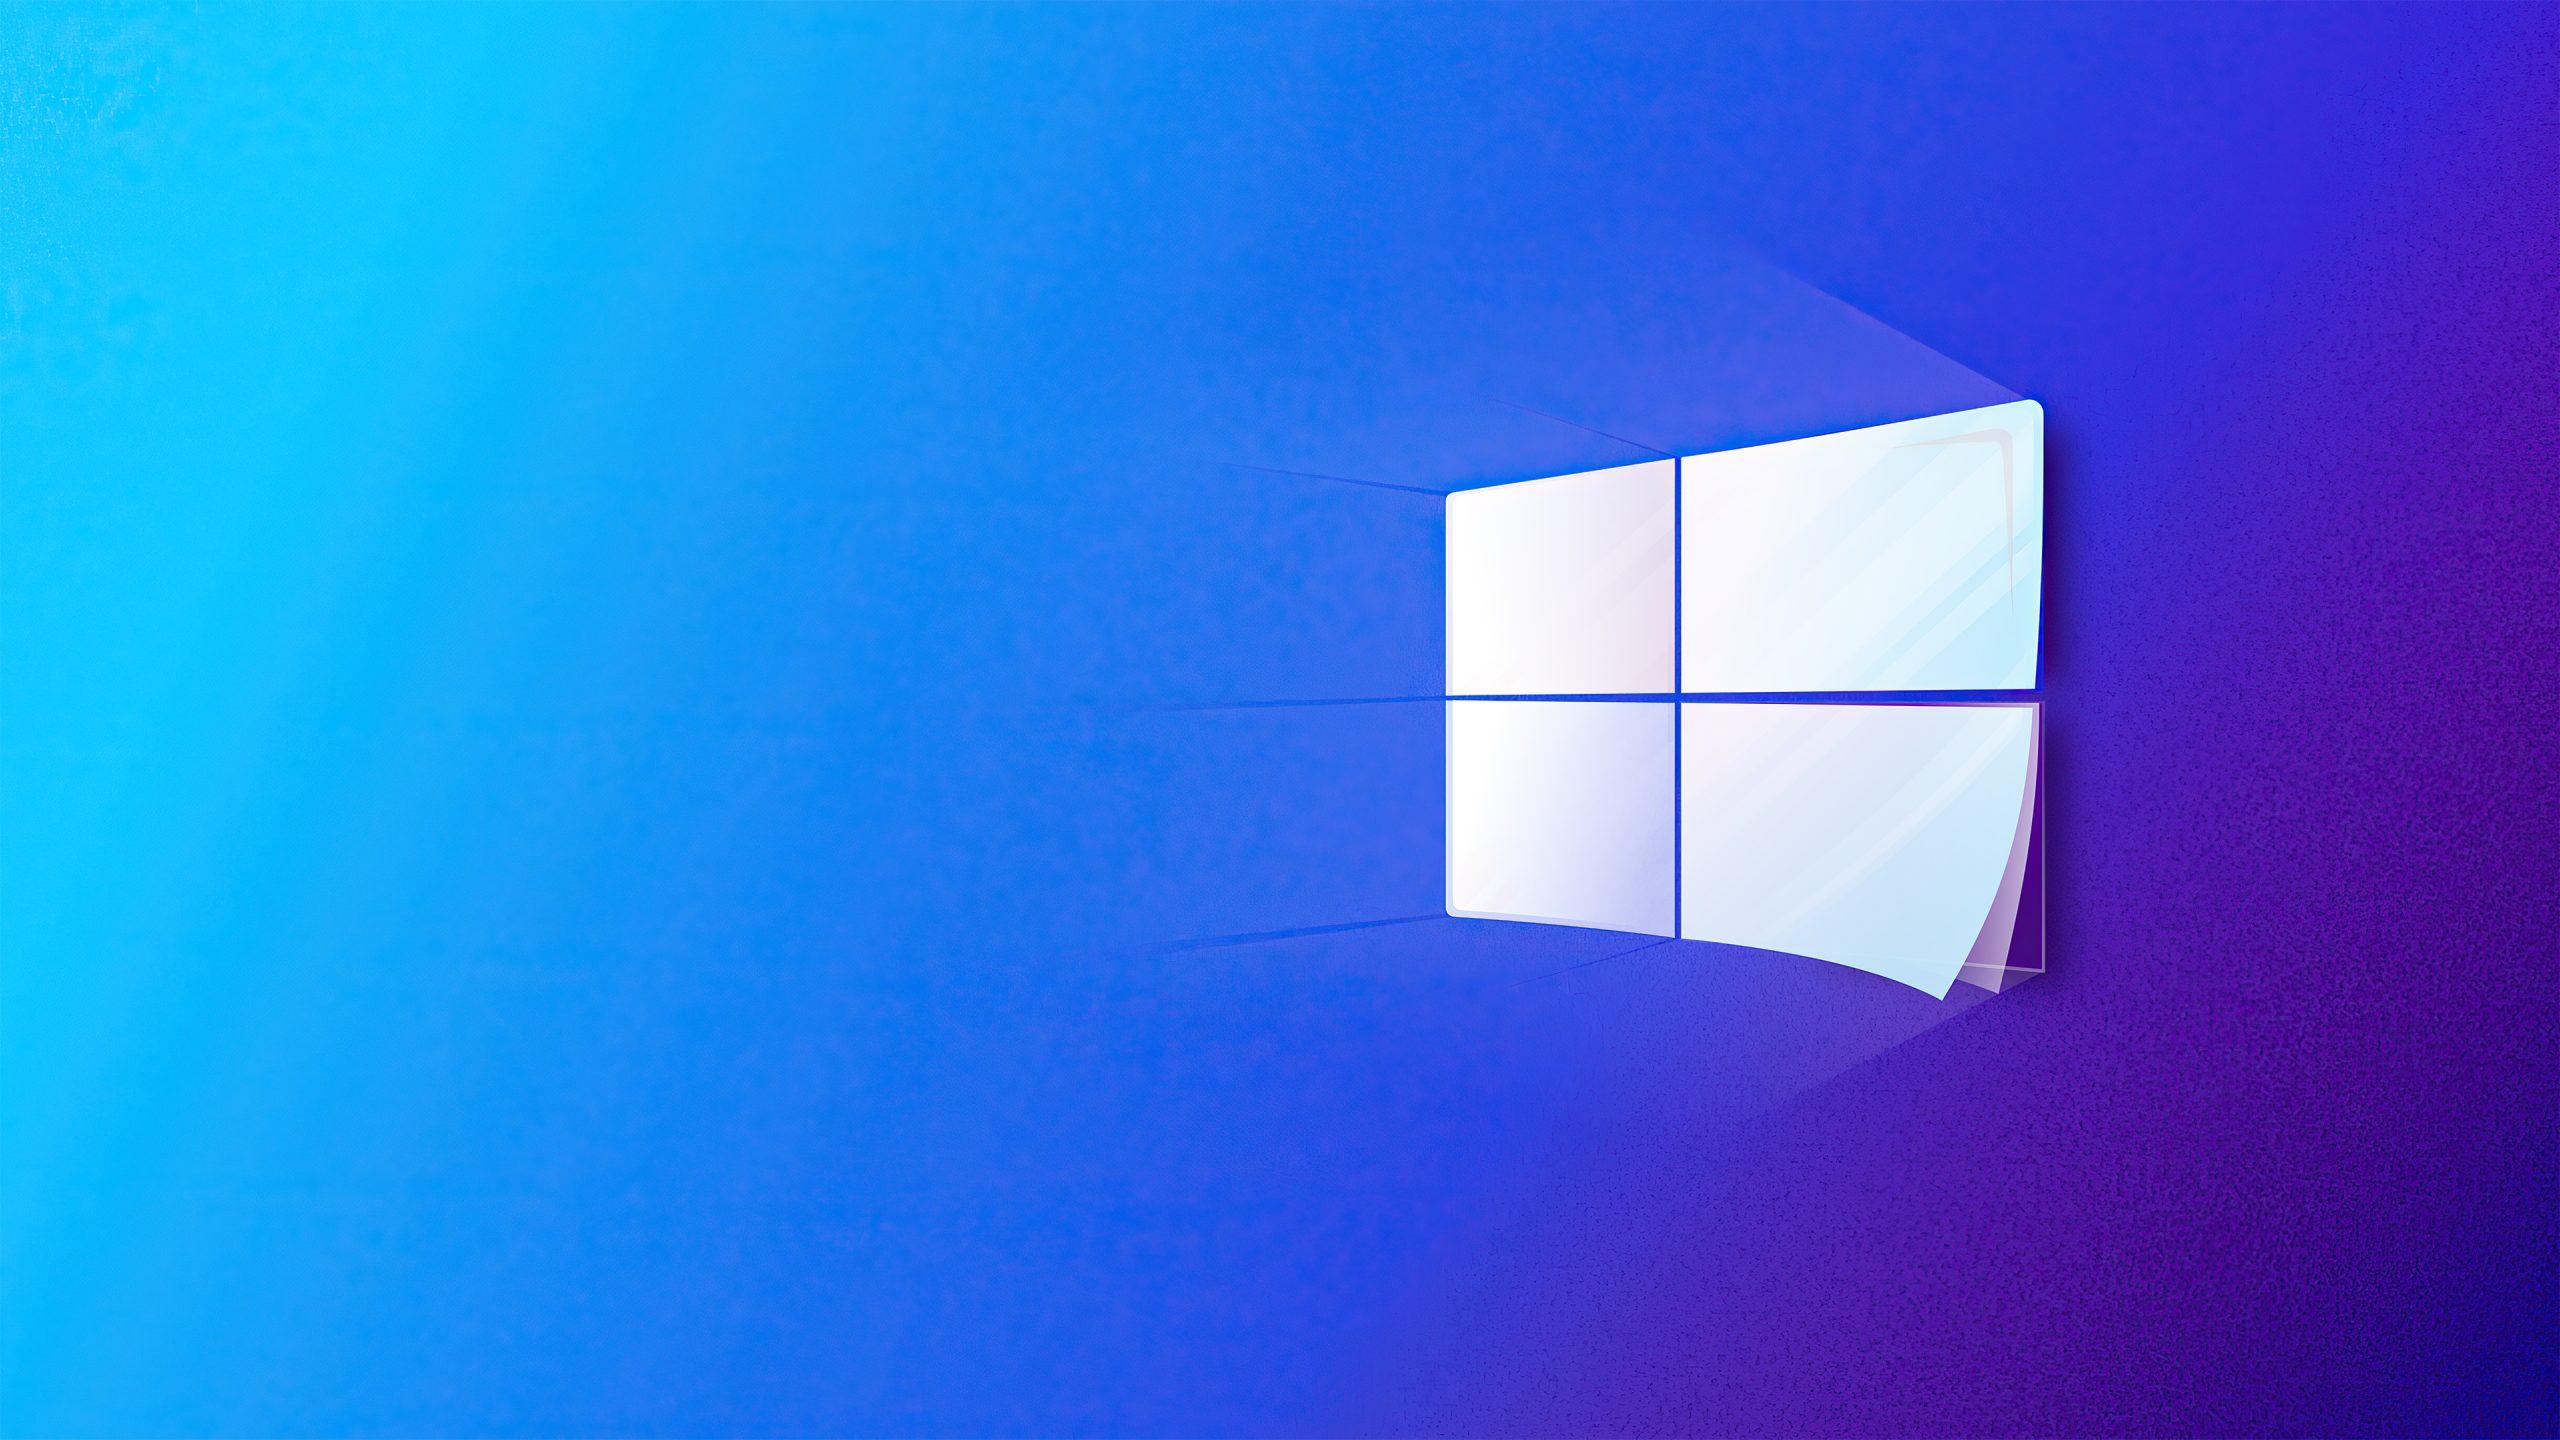 Windows 10 License Keys